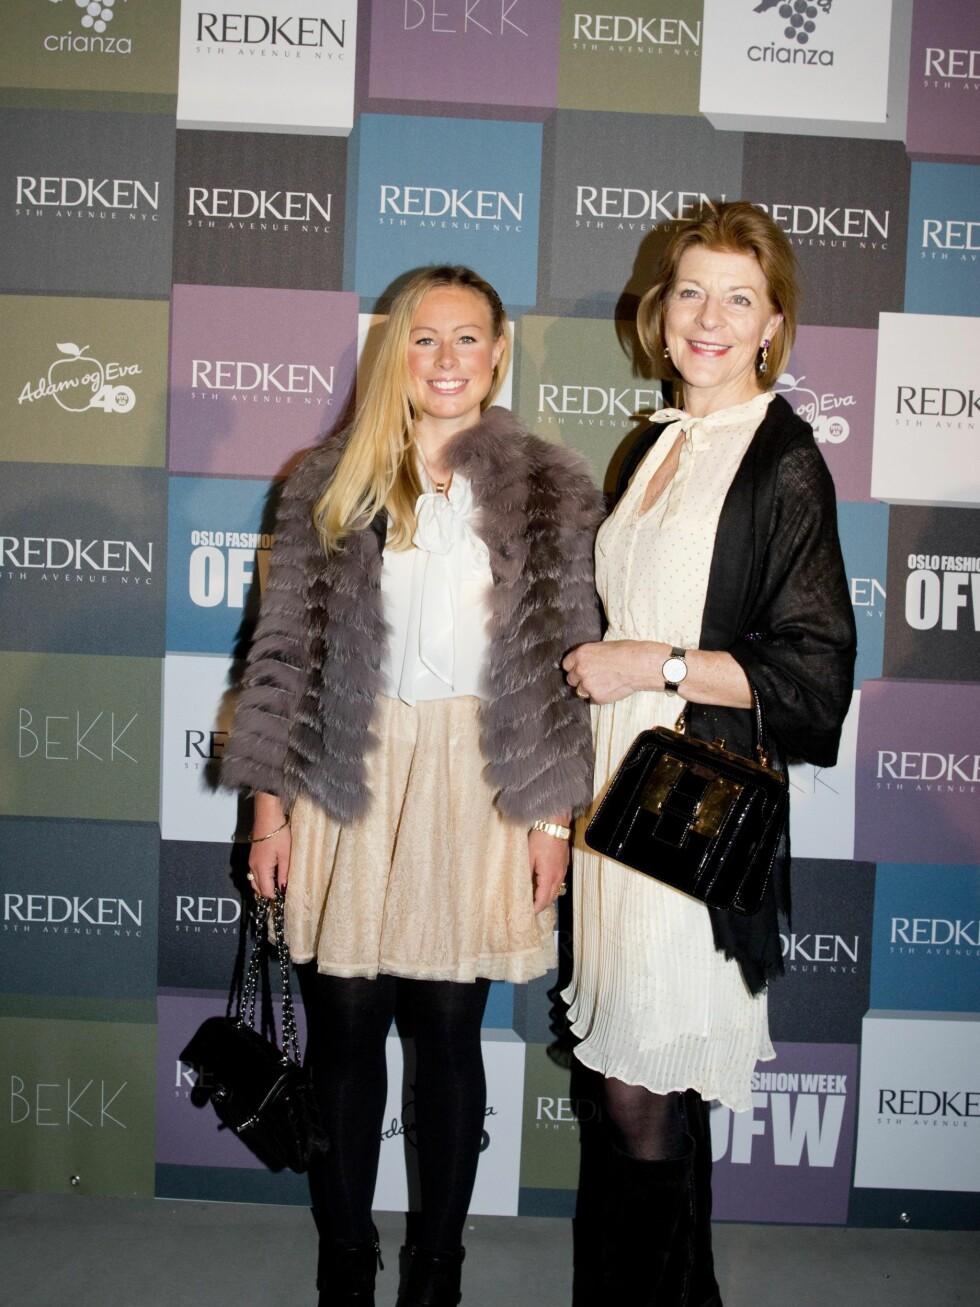 Mille Marie Treschow og datteren Victoria. Foto: Sara Johannessen